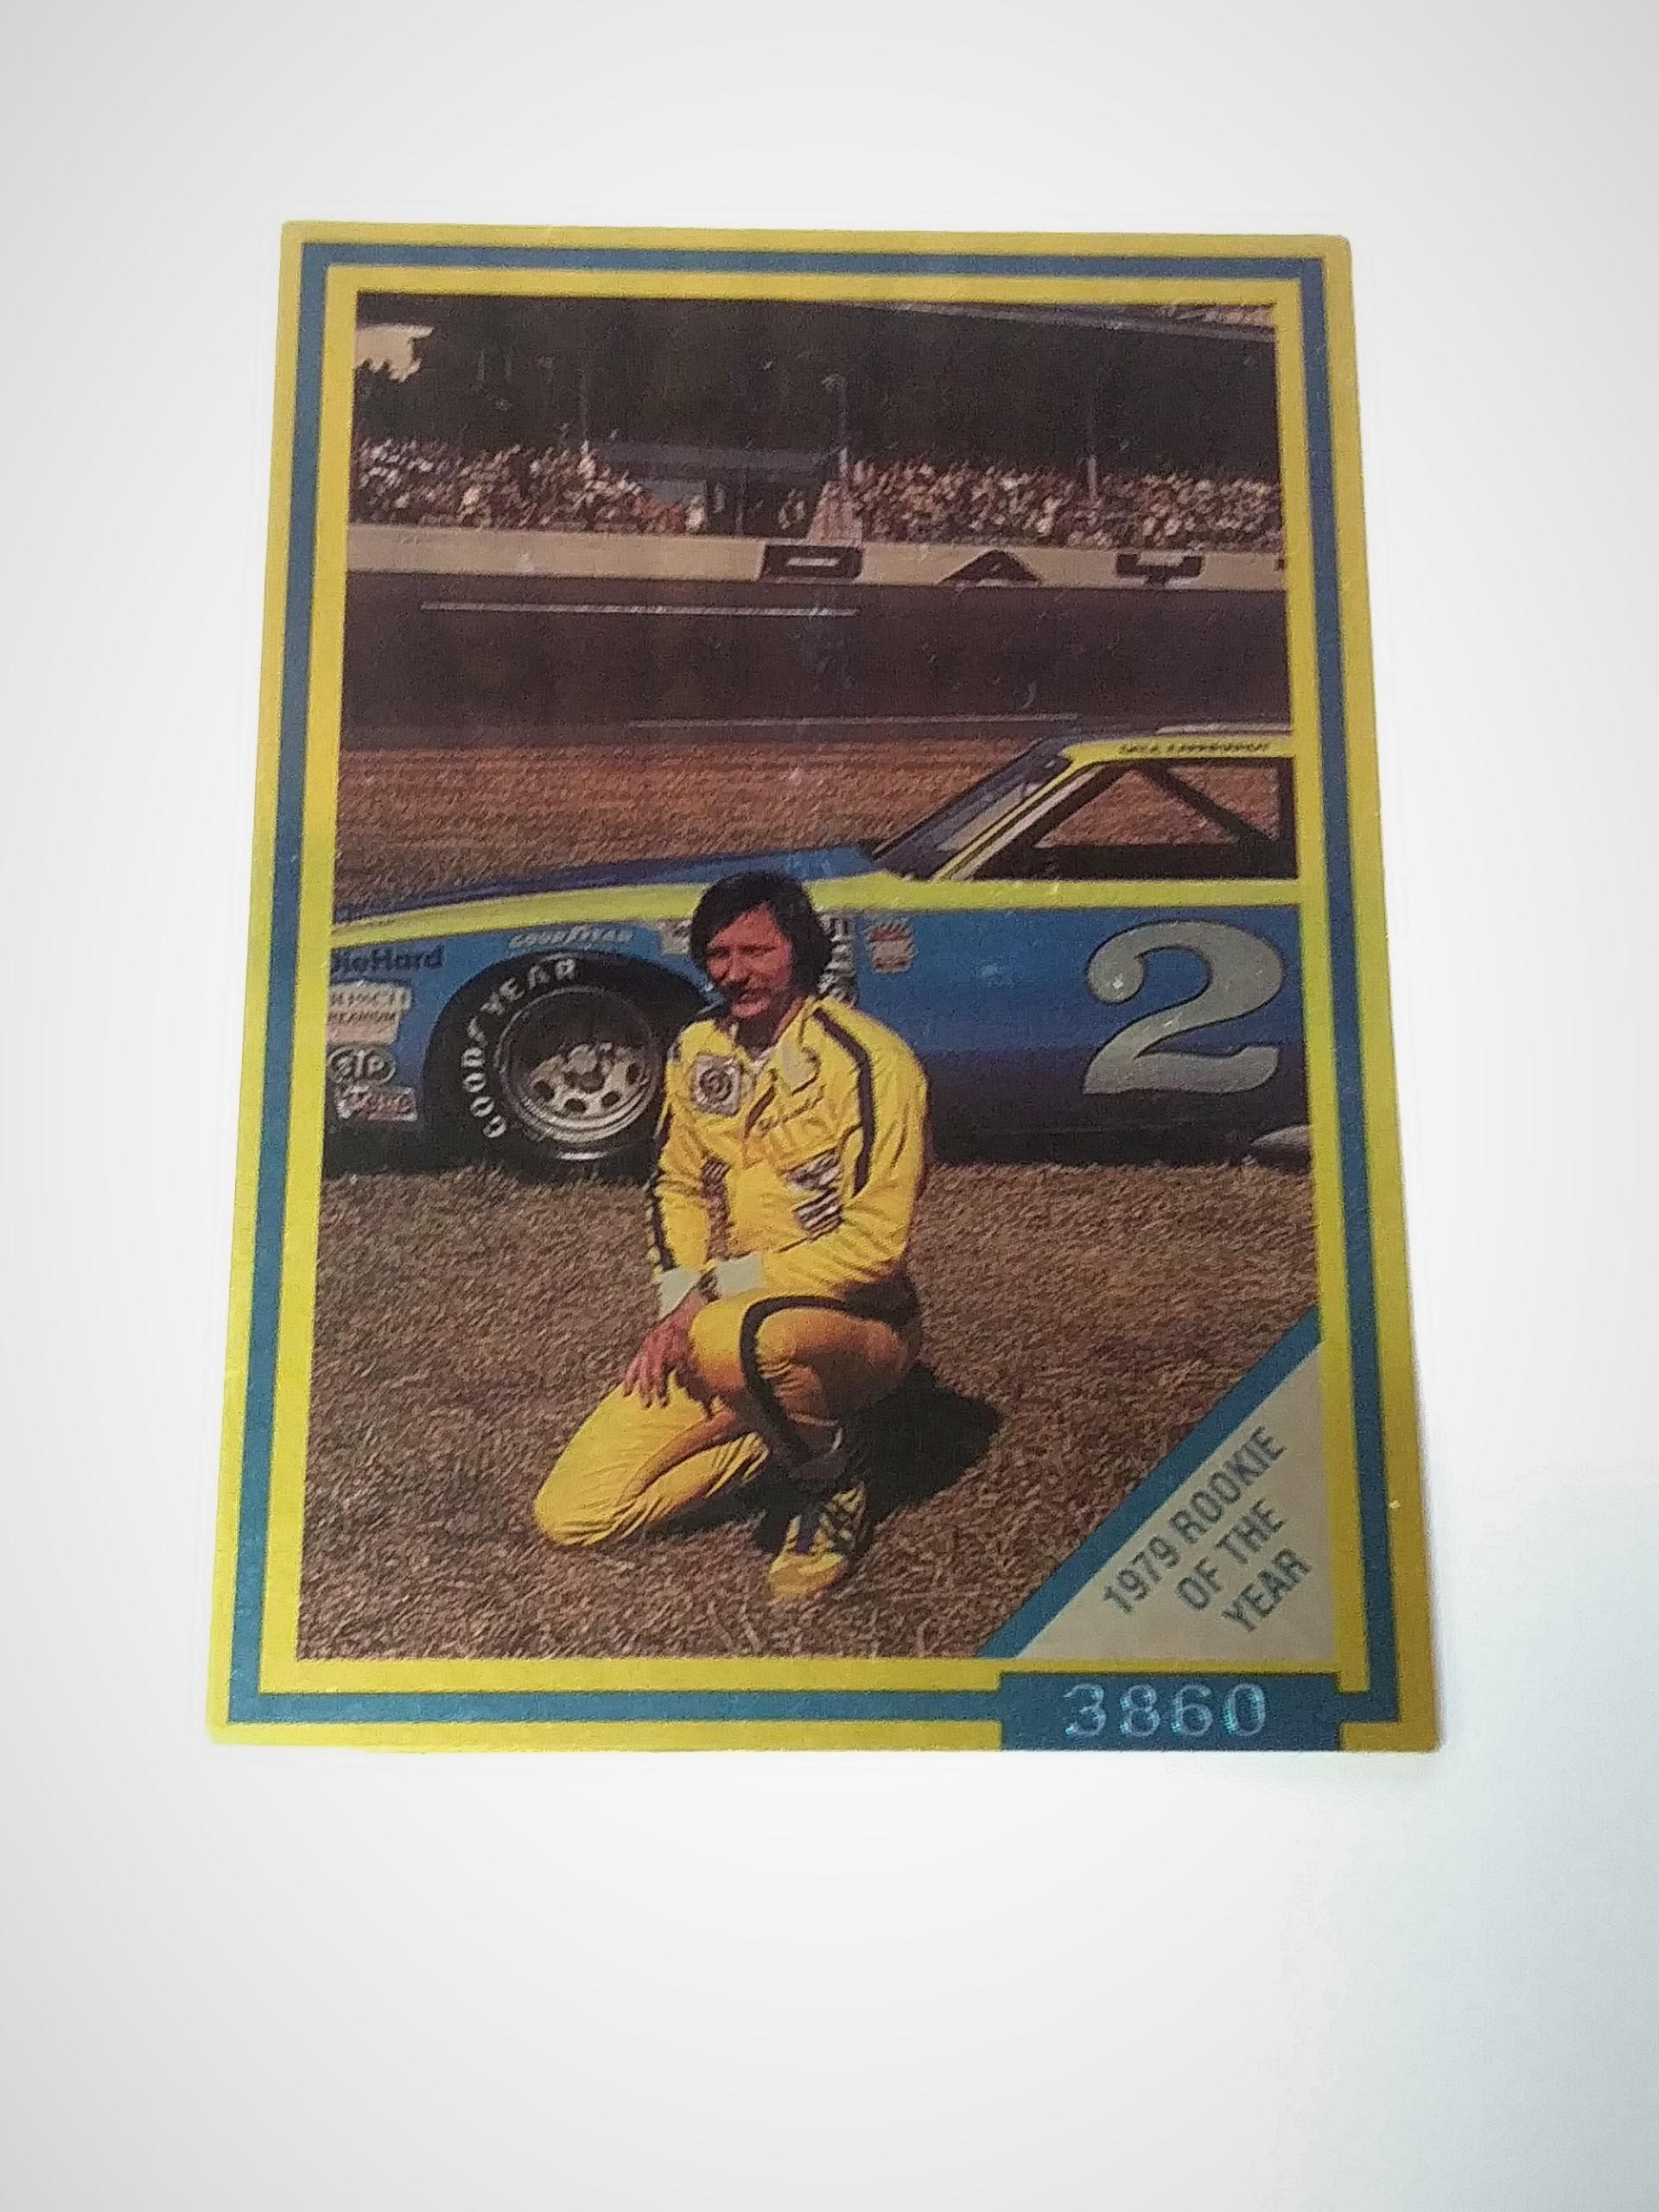 1994 Card Dynamics Double Eagle Dale Earnhardt 6 Metal Card Set NASCAR Racing